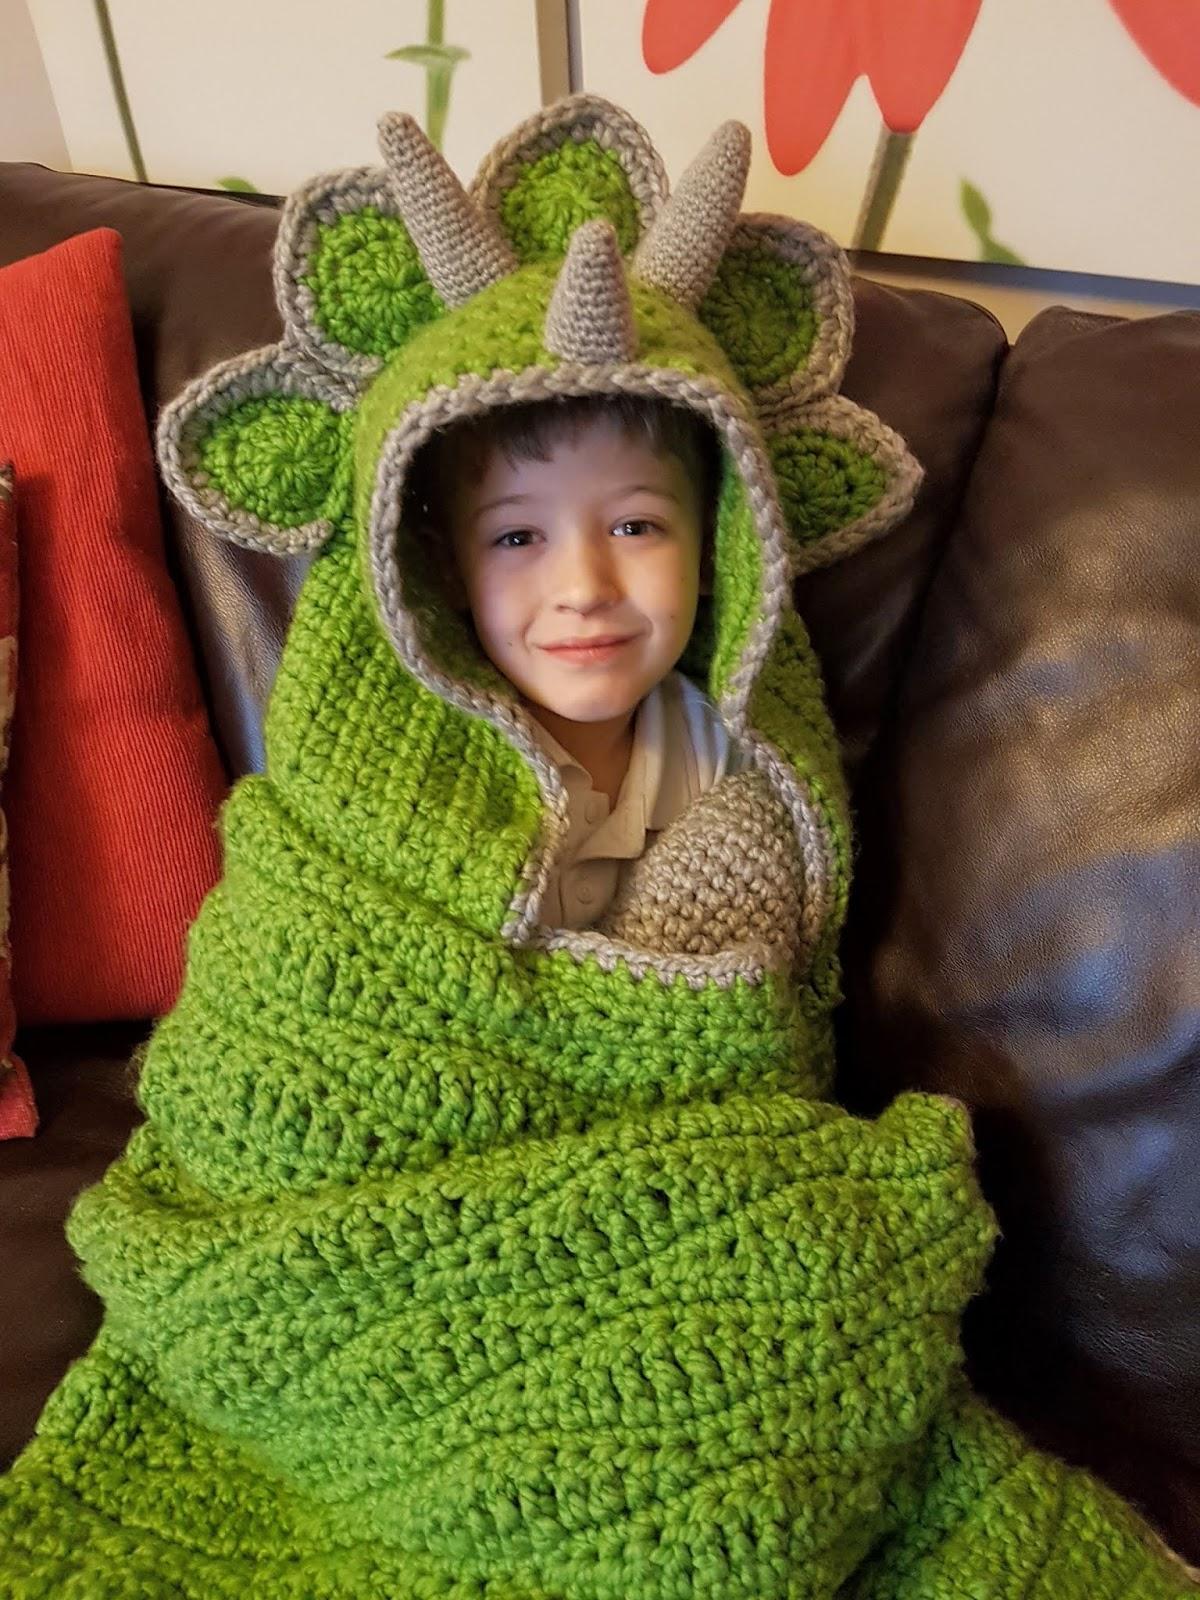 946065f77257 Crochet Pattern 2 in 1 Hooded Dinosaur Blanket Triceratops or ...